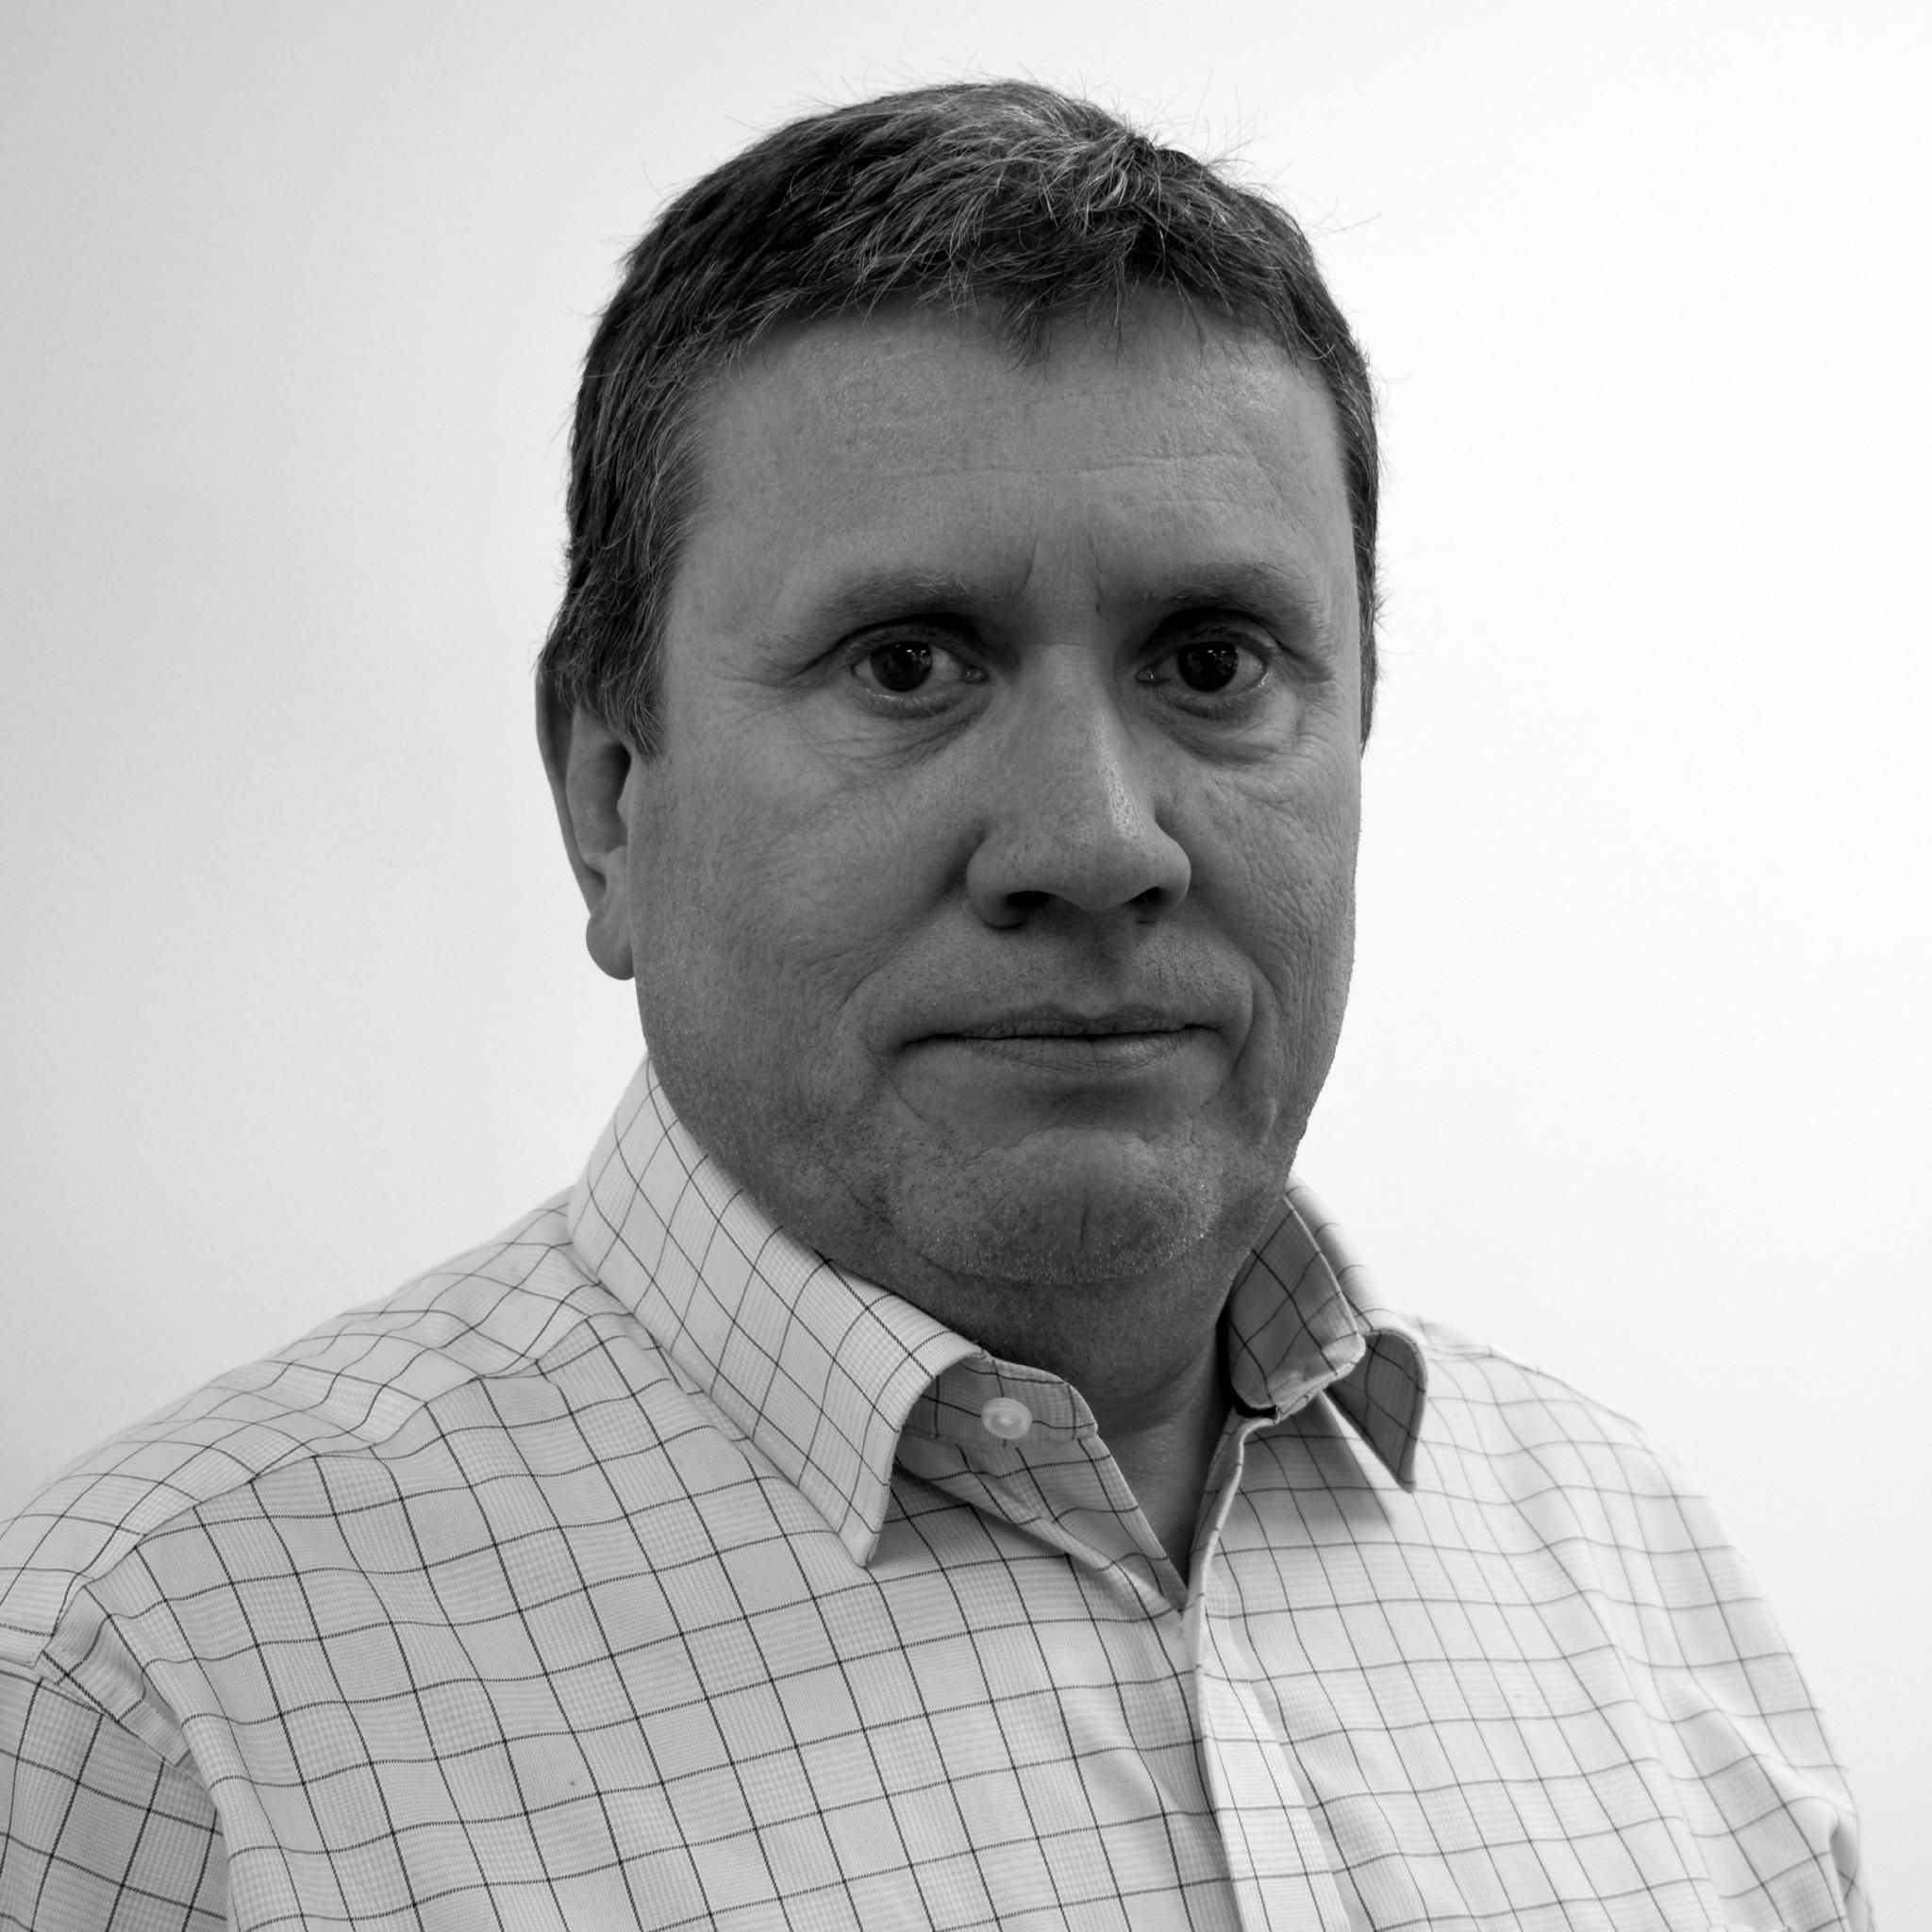 David Keeble